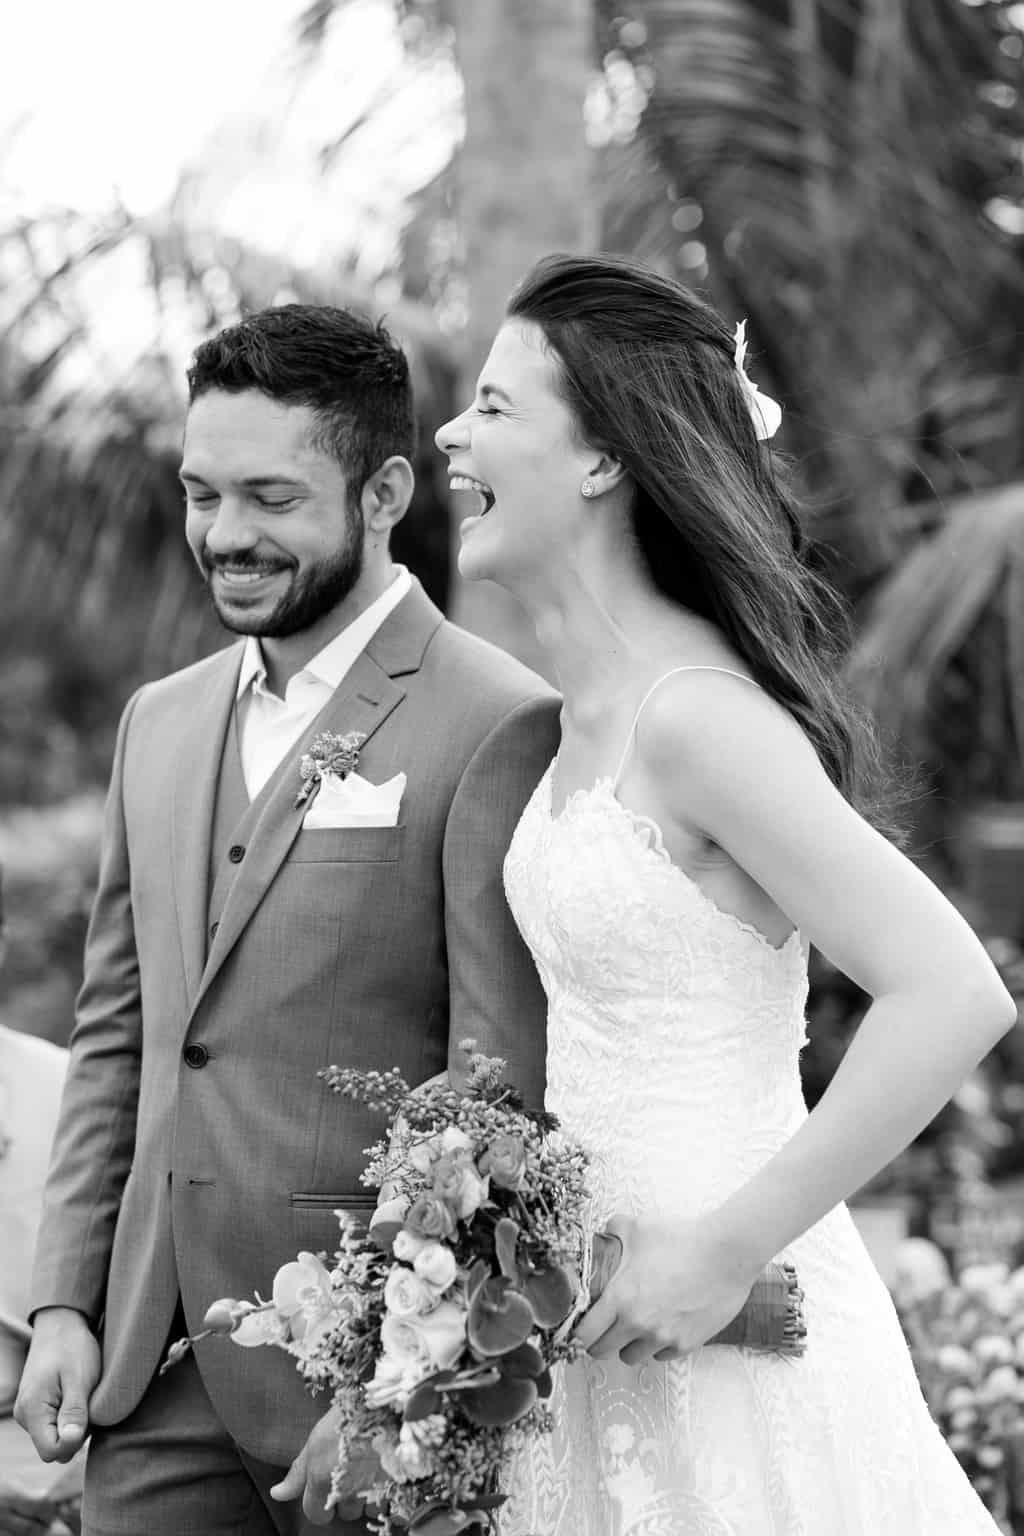 Casamento-Emanuelle-e-Alysson-Fotografia-Tadeu-Nanó-e-Luca-Antunes83